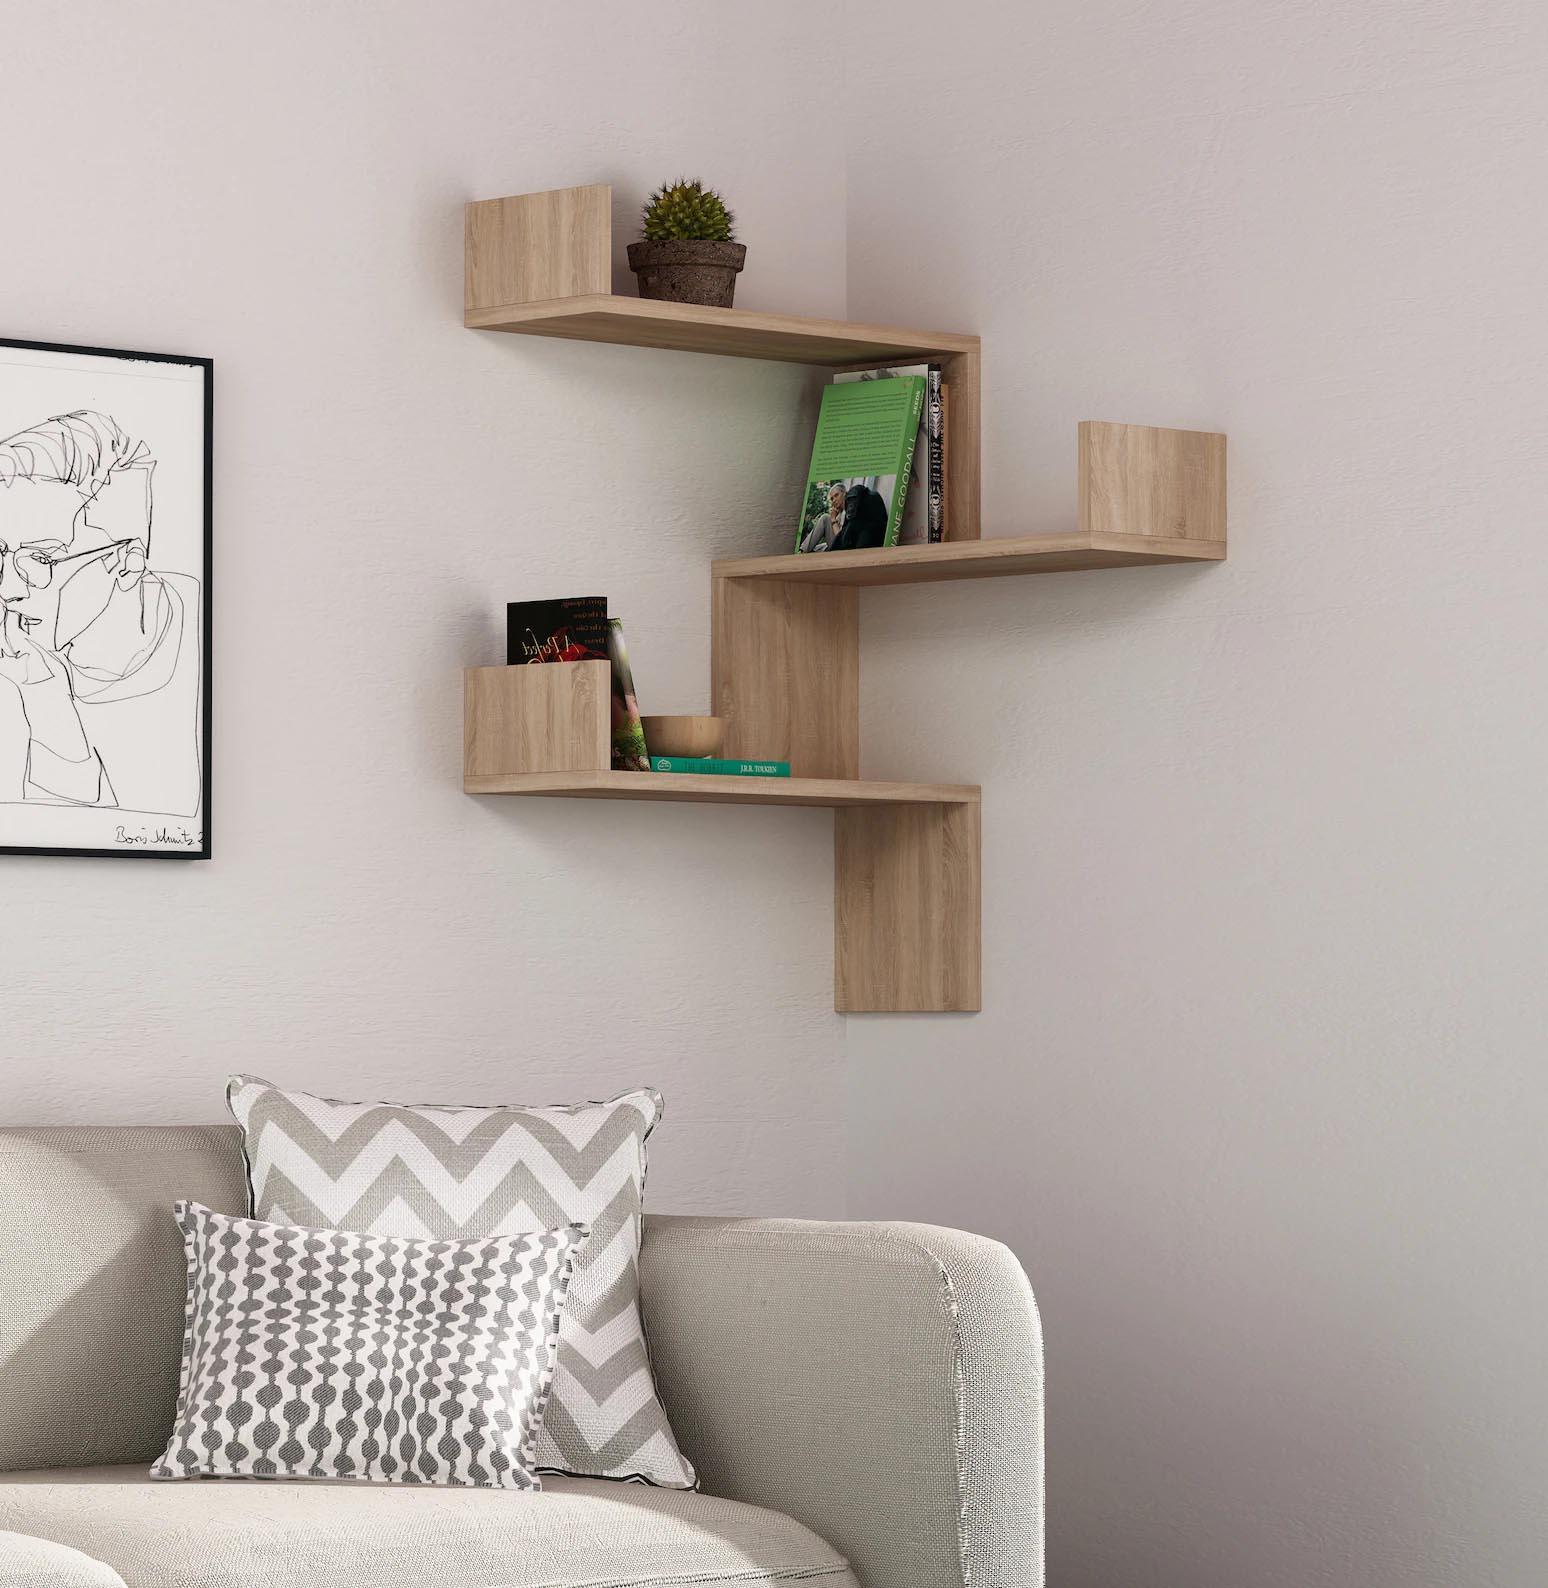 Corner Shelf Ideas - A wall-mounted corner shelf made from wood.